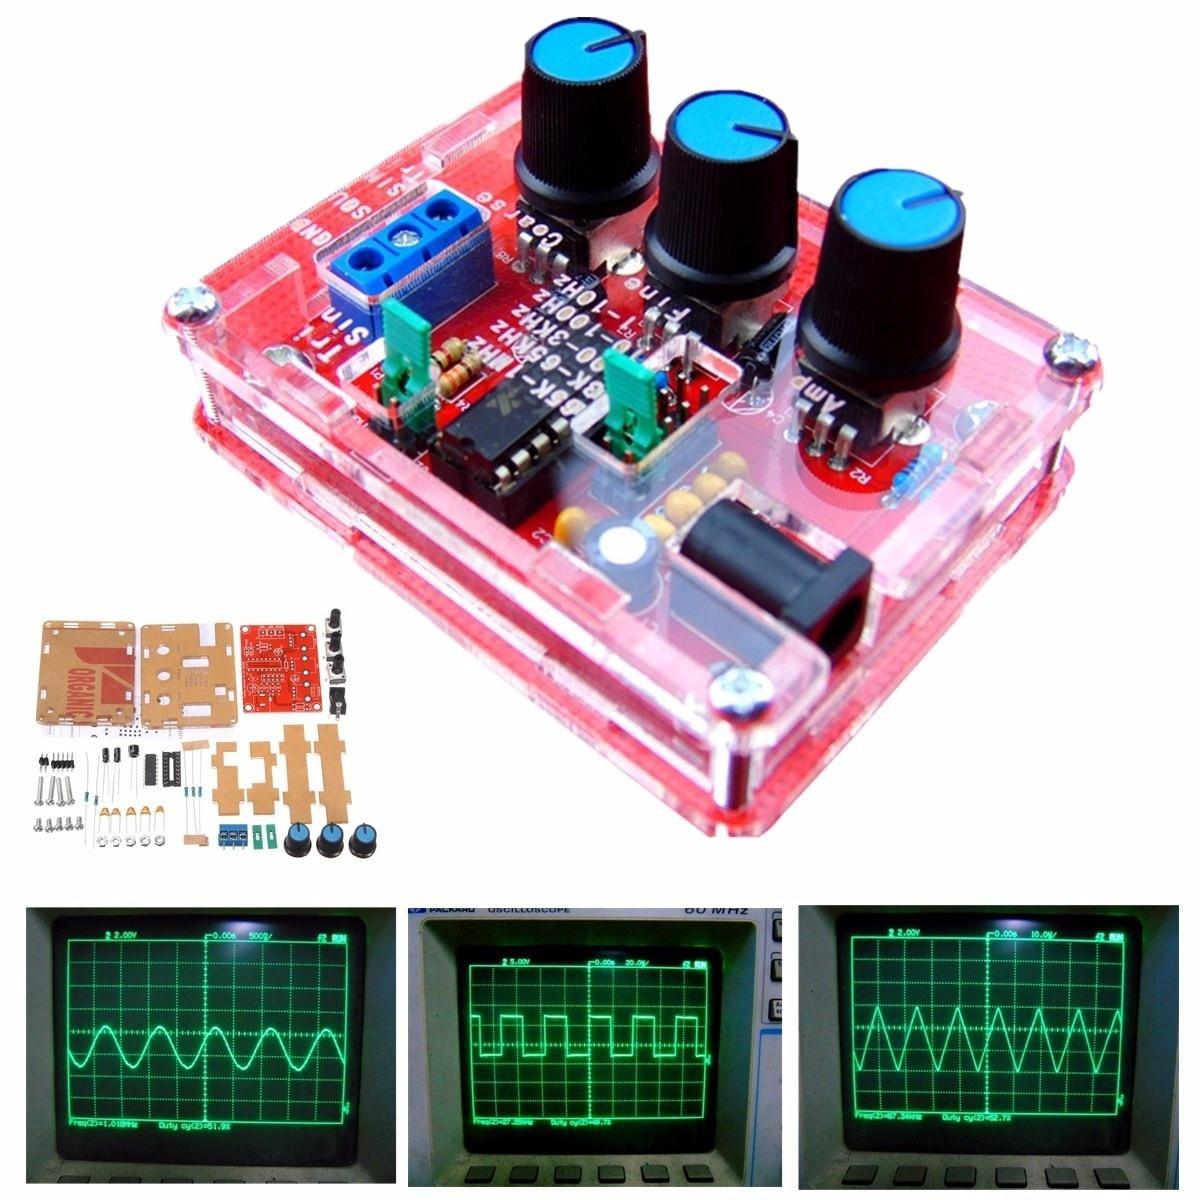 Qoo10 Xr2206 Function Signal Generator Diy Kit Sine Triangle Squarewave Circuit Show All Item Images